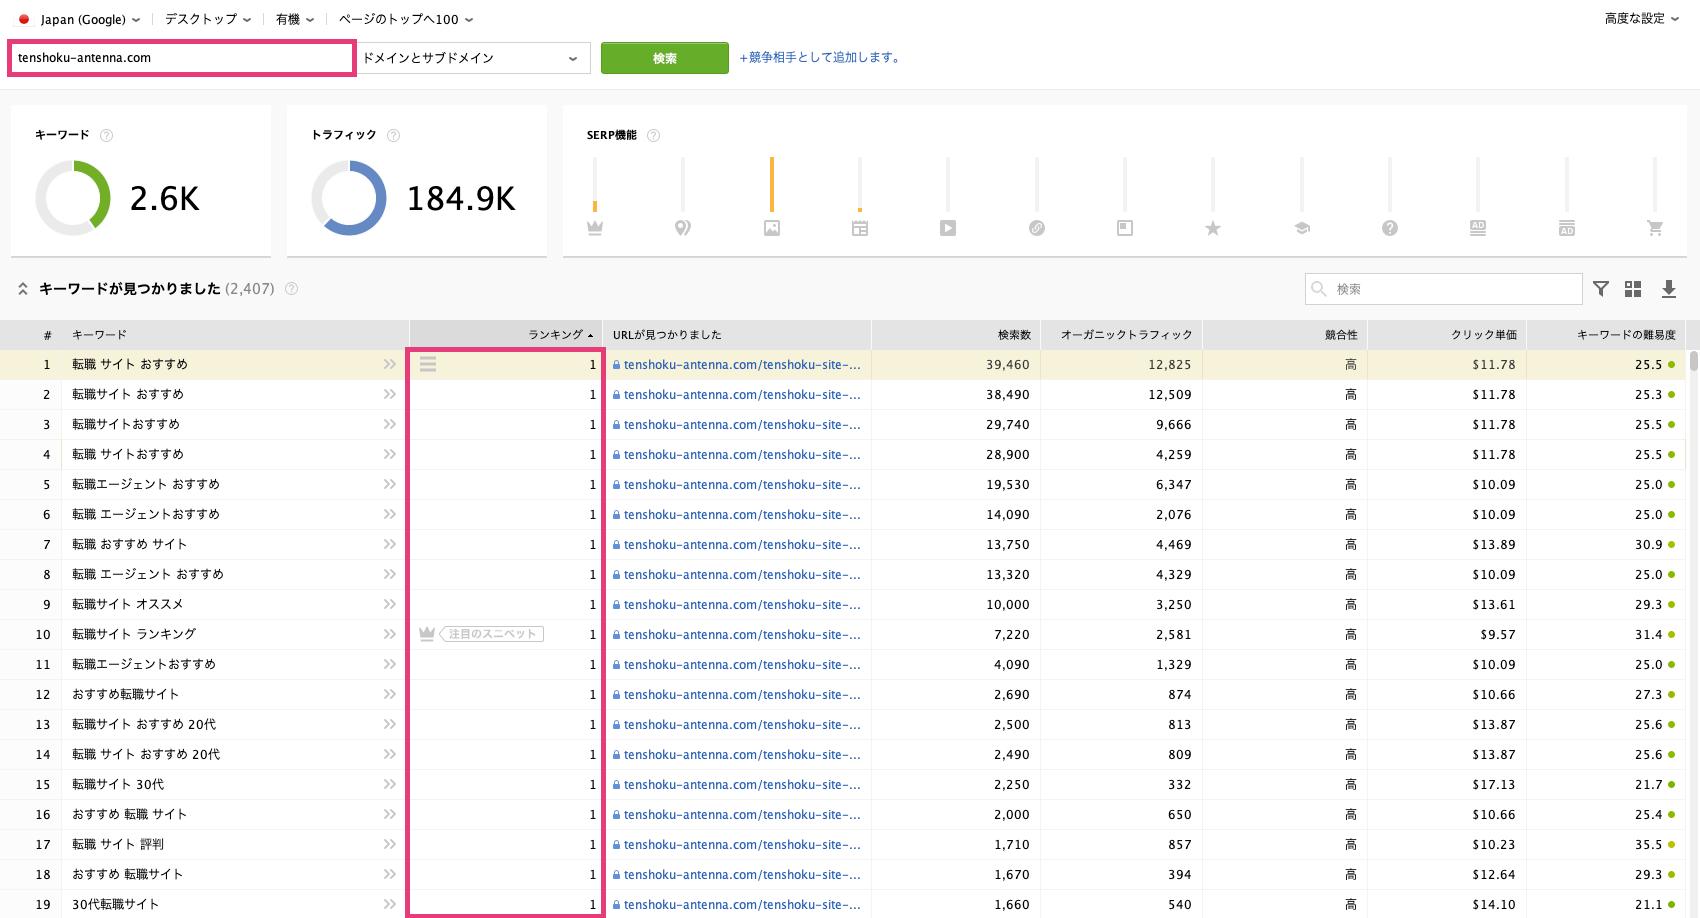 RankTrackerで調べた転職アンテナのランキング情報